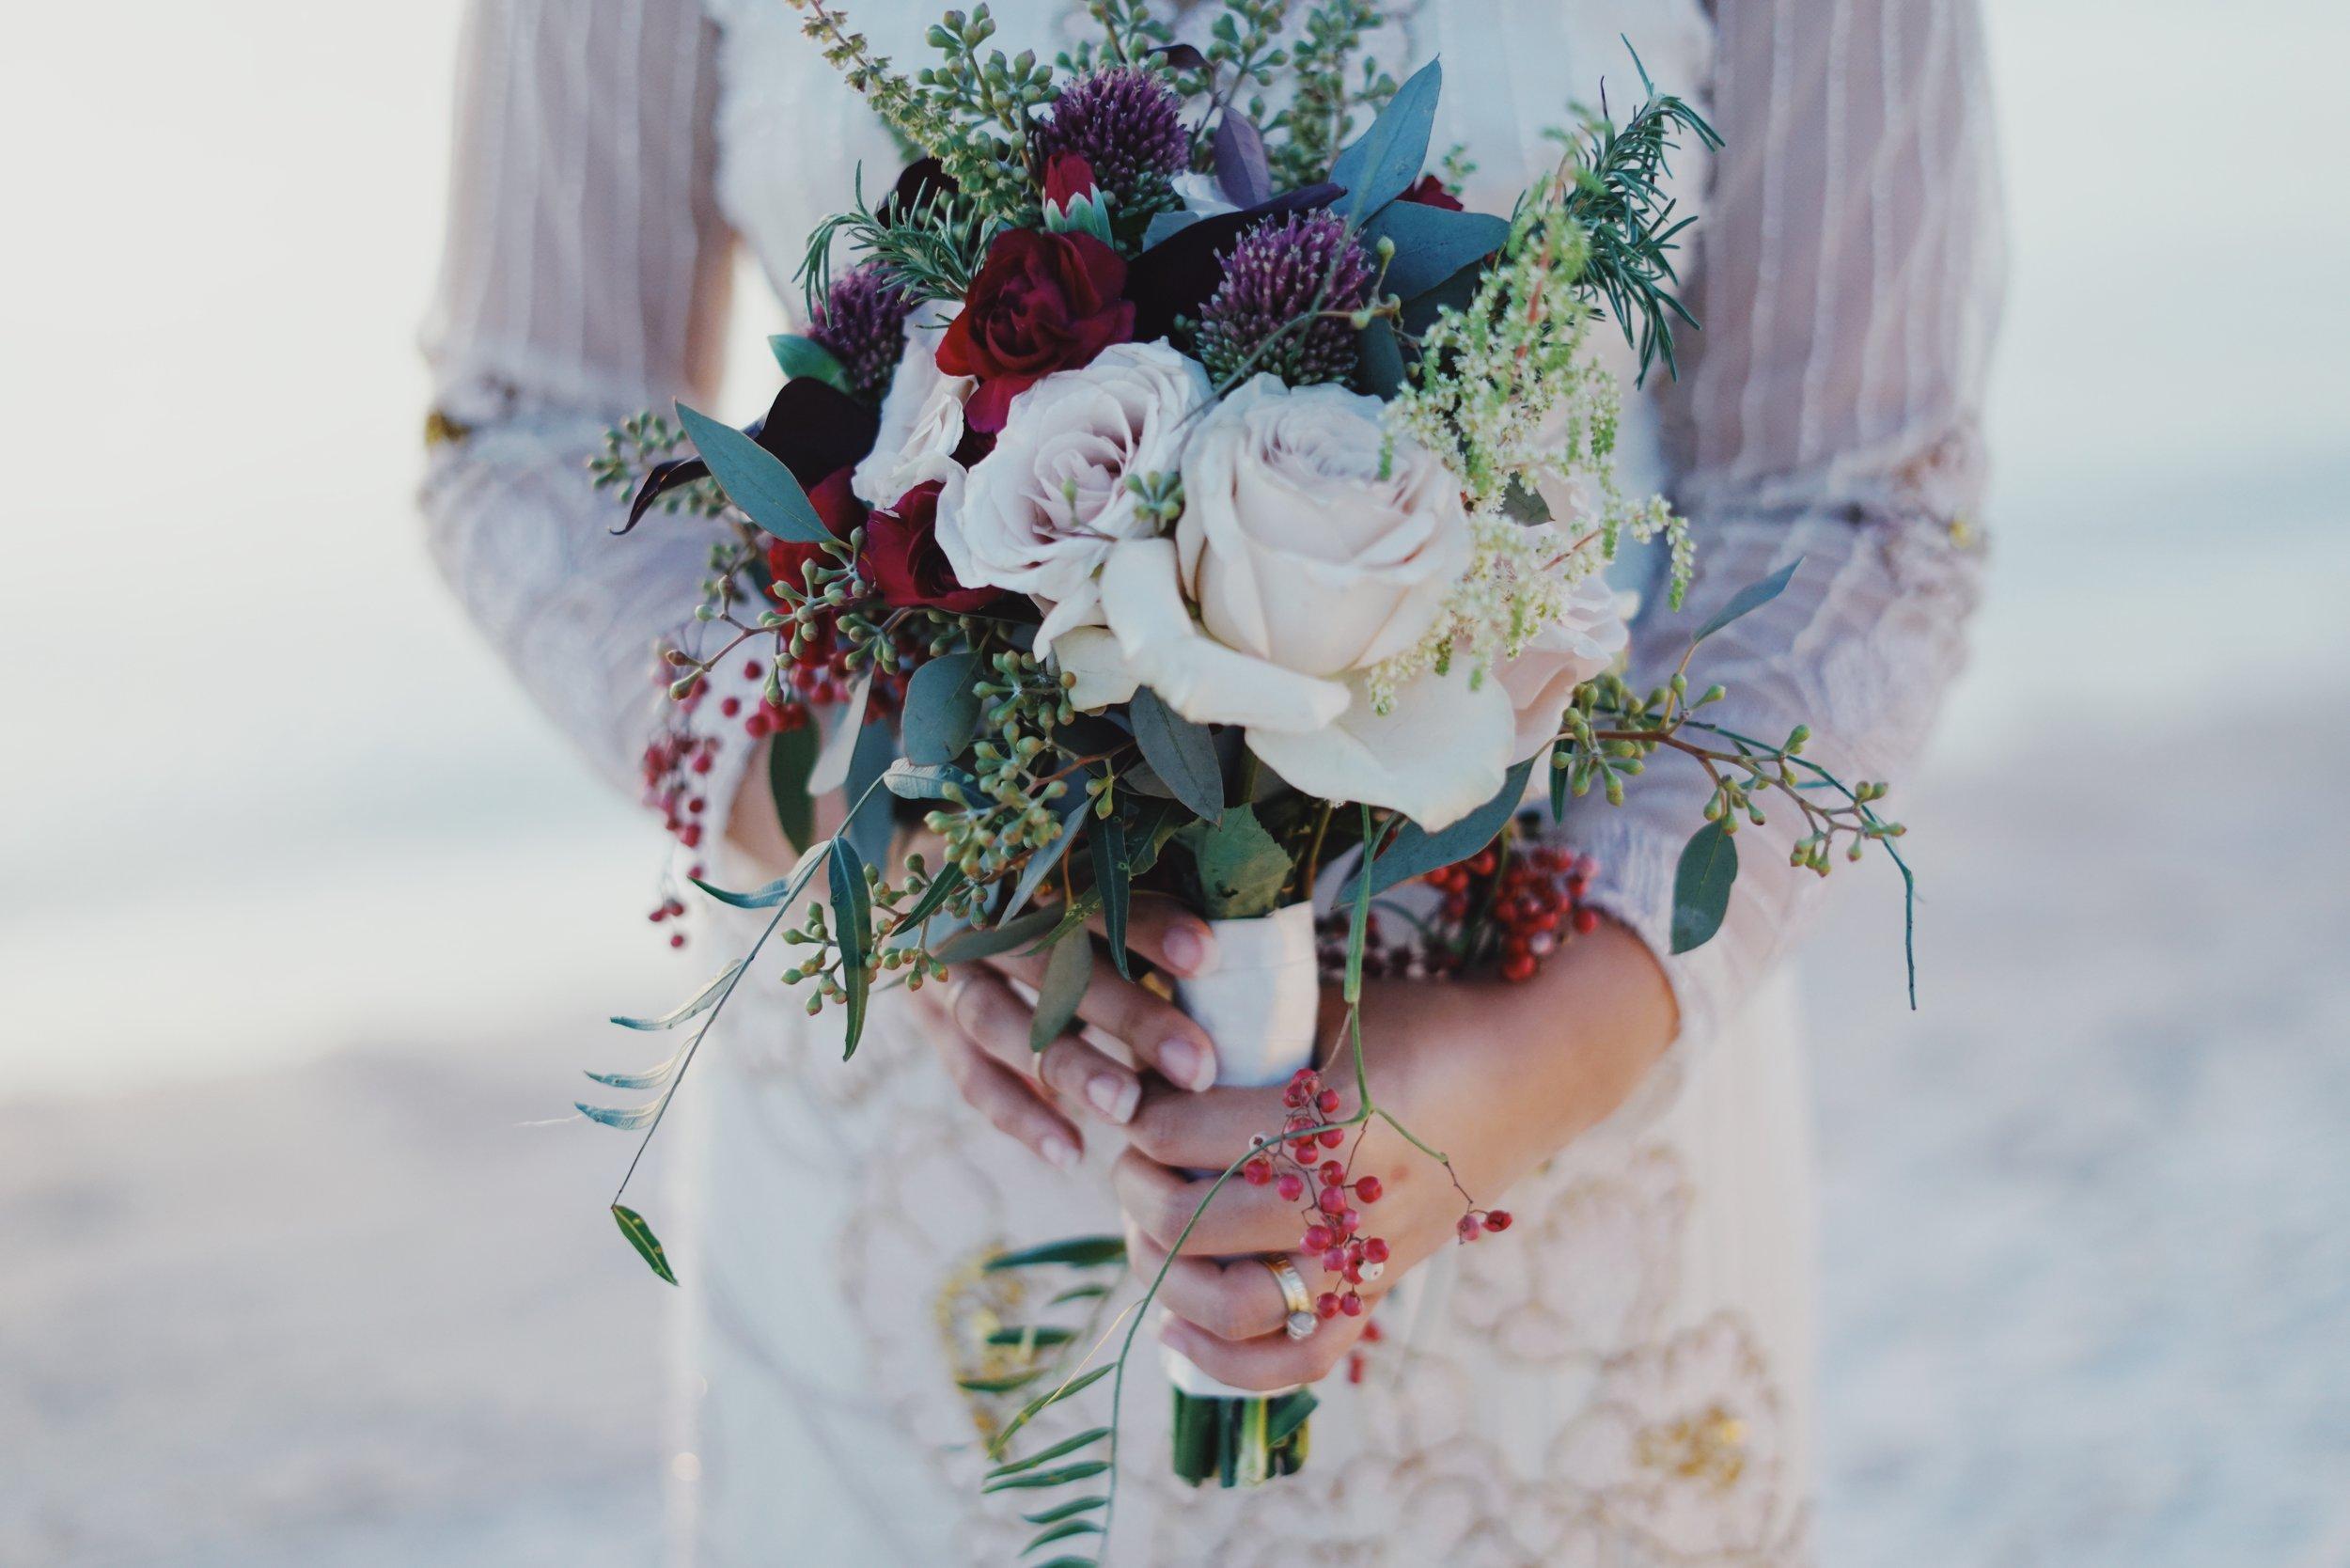 beautiful-blooming-bouquet-759668.jpg